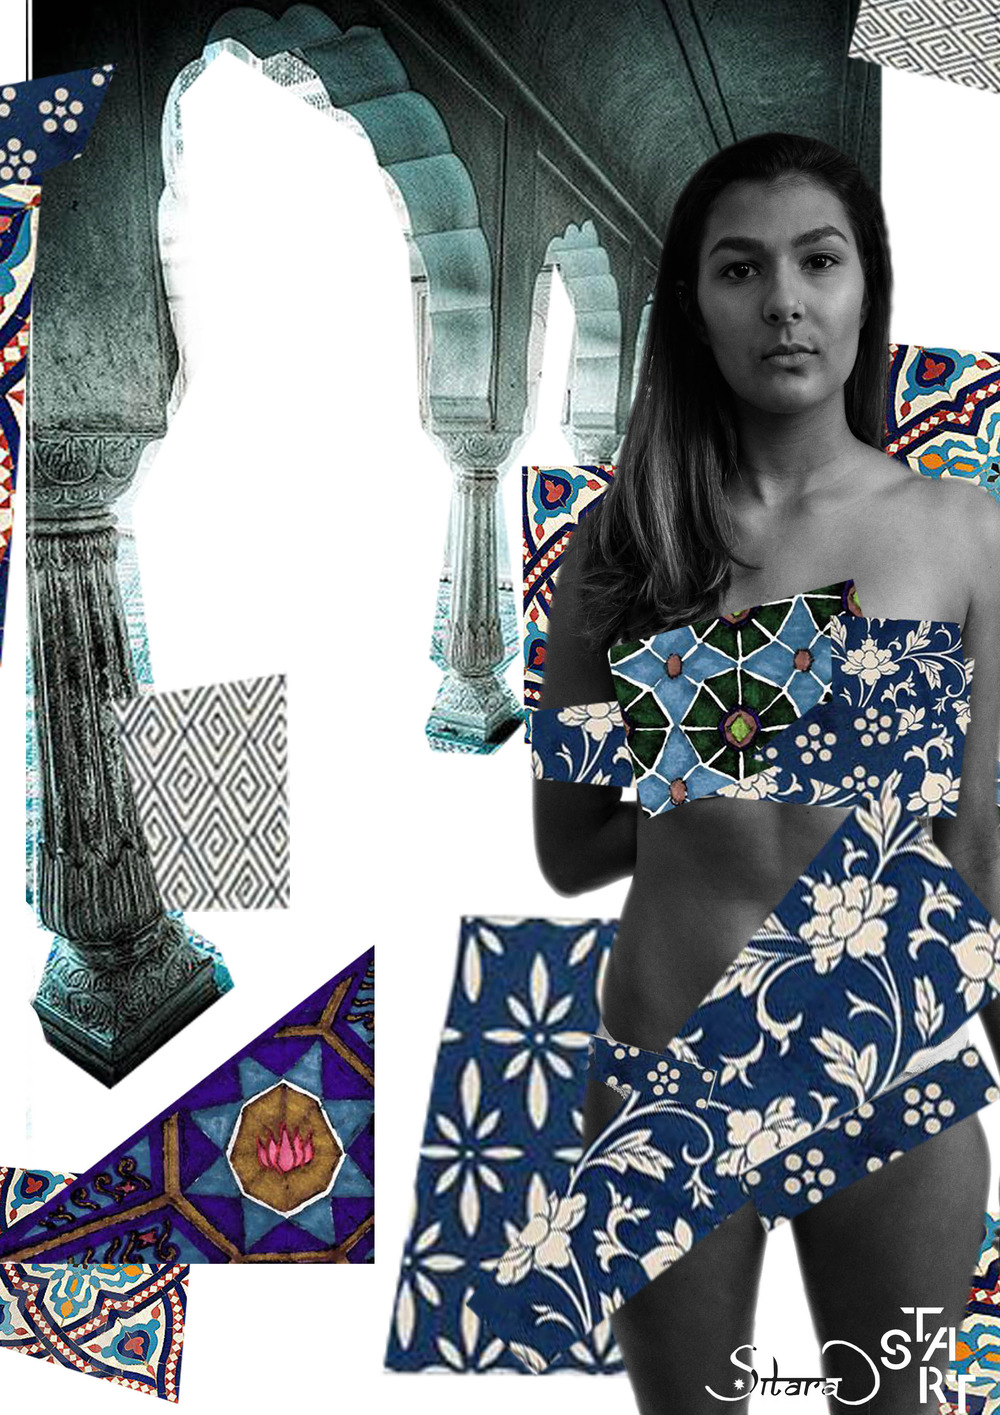 Model: Stephanie Uhlmann. Collage: Neha Luthra.